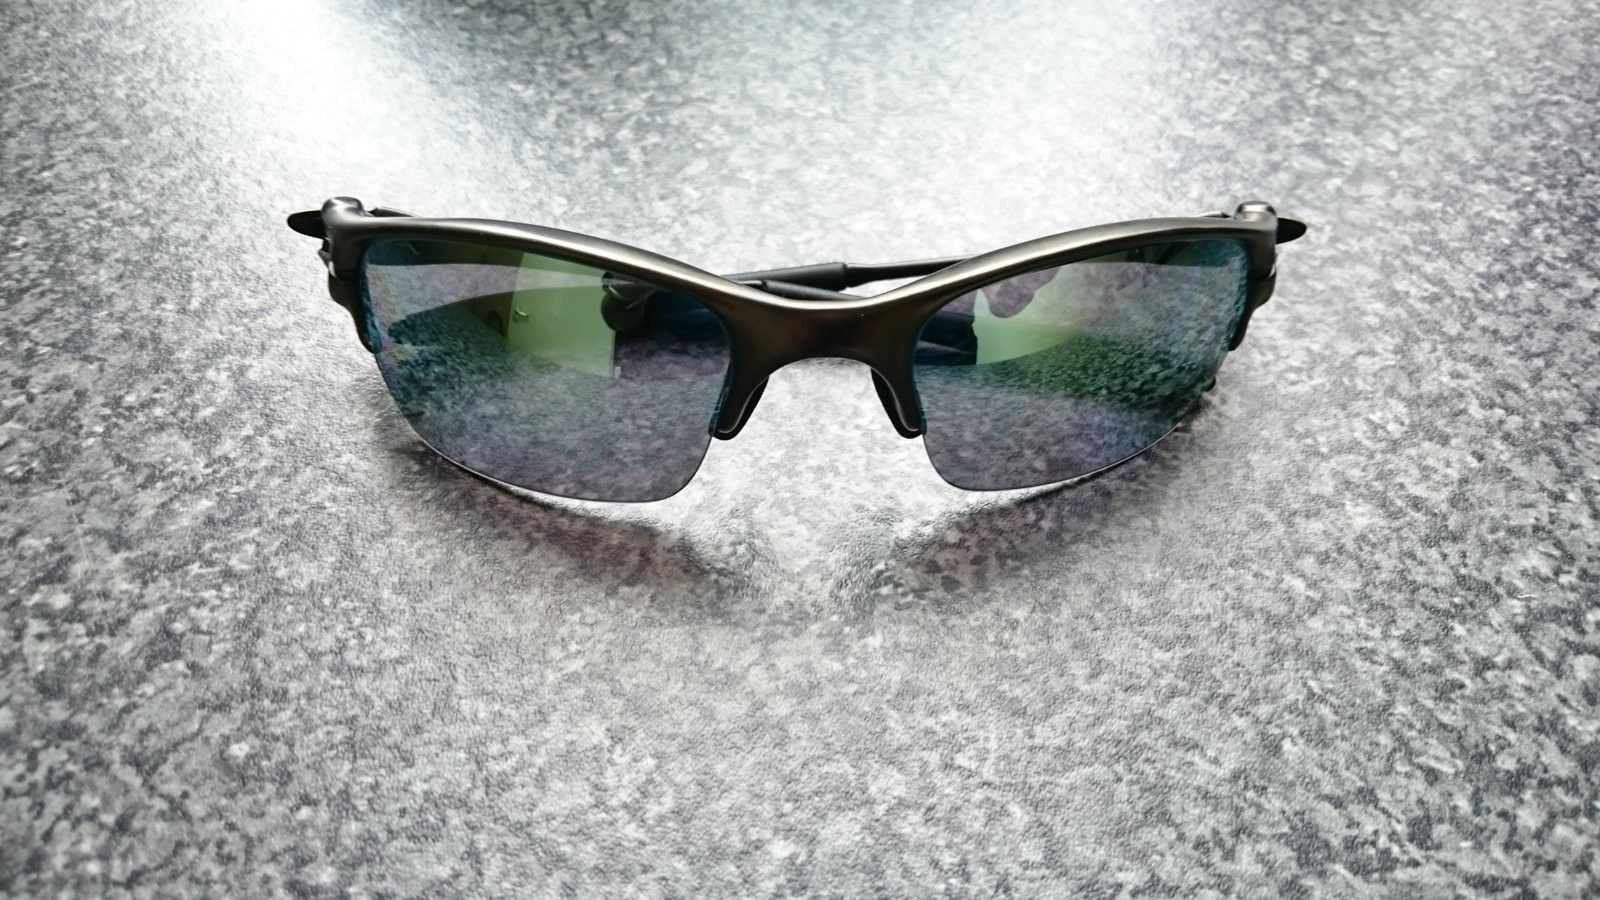 Carbon half-x w/BIP & Emerald lenses **SPF** - DSC_0748.JPG